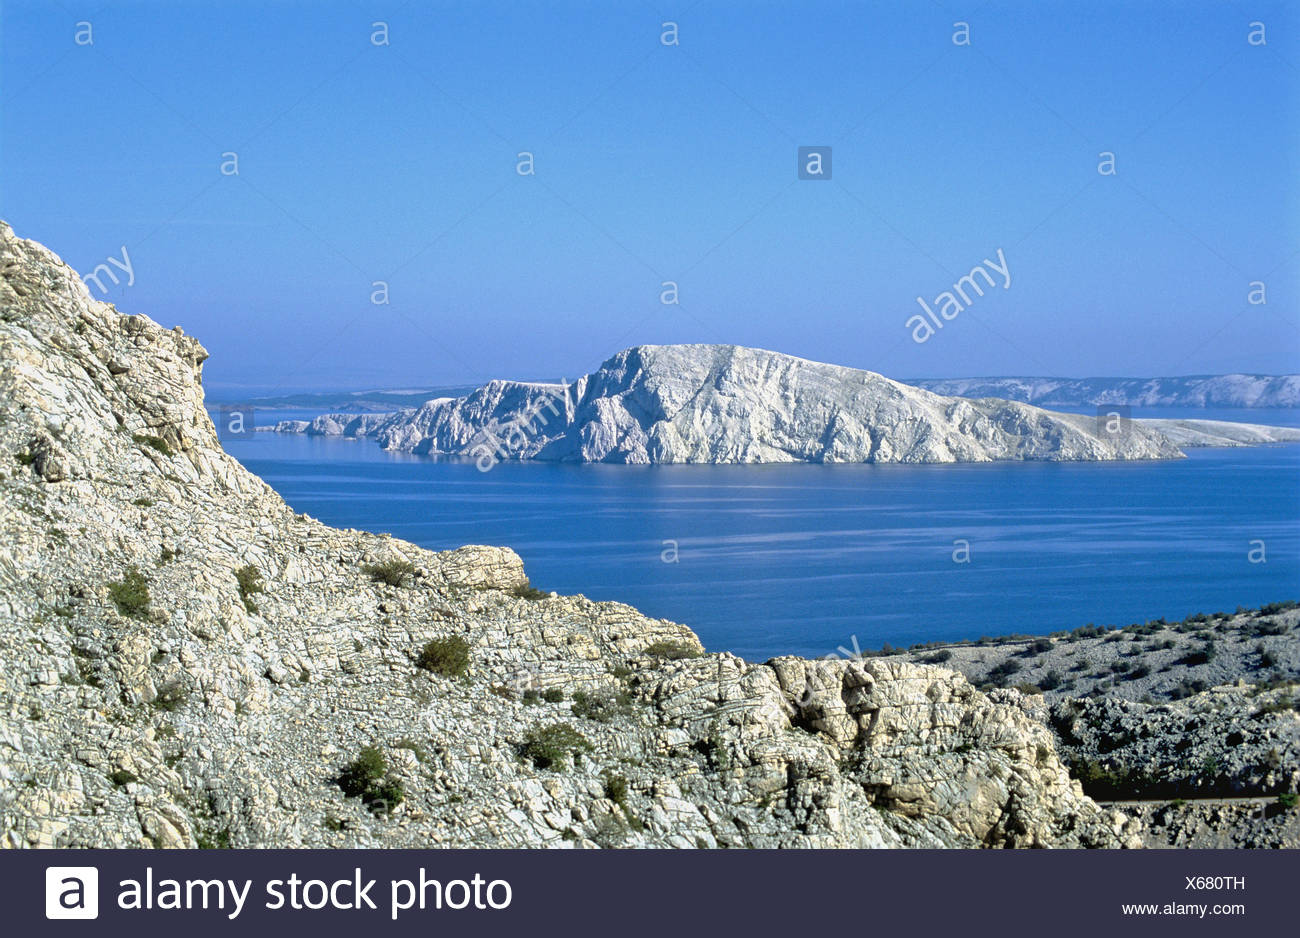 Croatia Europe Kvarner Bay Goli Otok island during Tito communist government island concentration camp politica - Stock Image